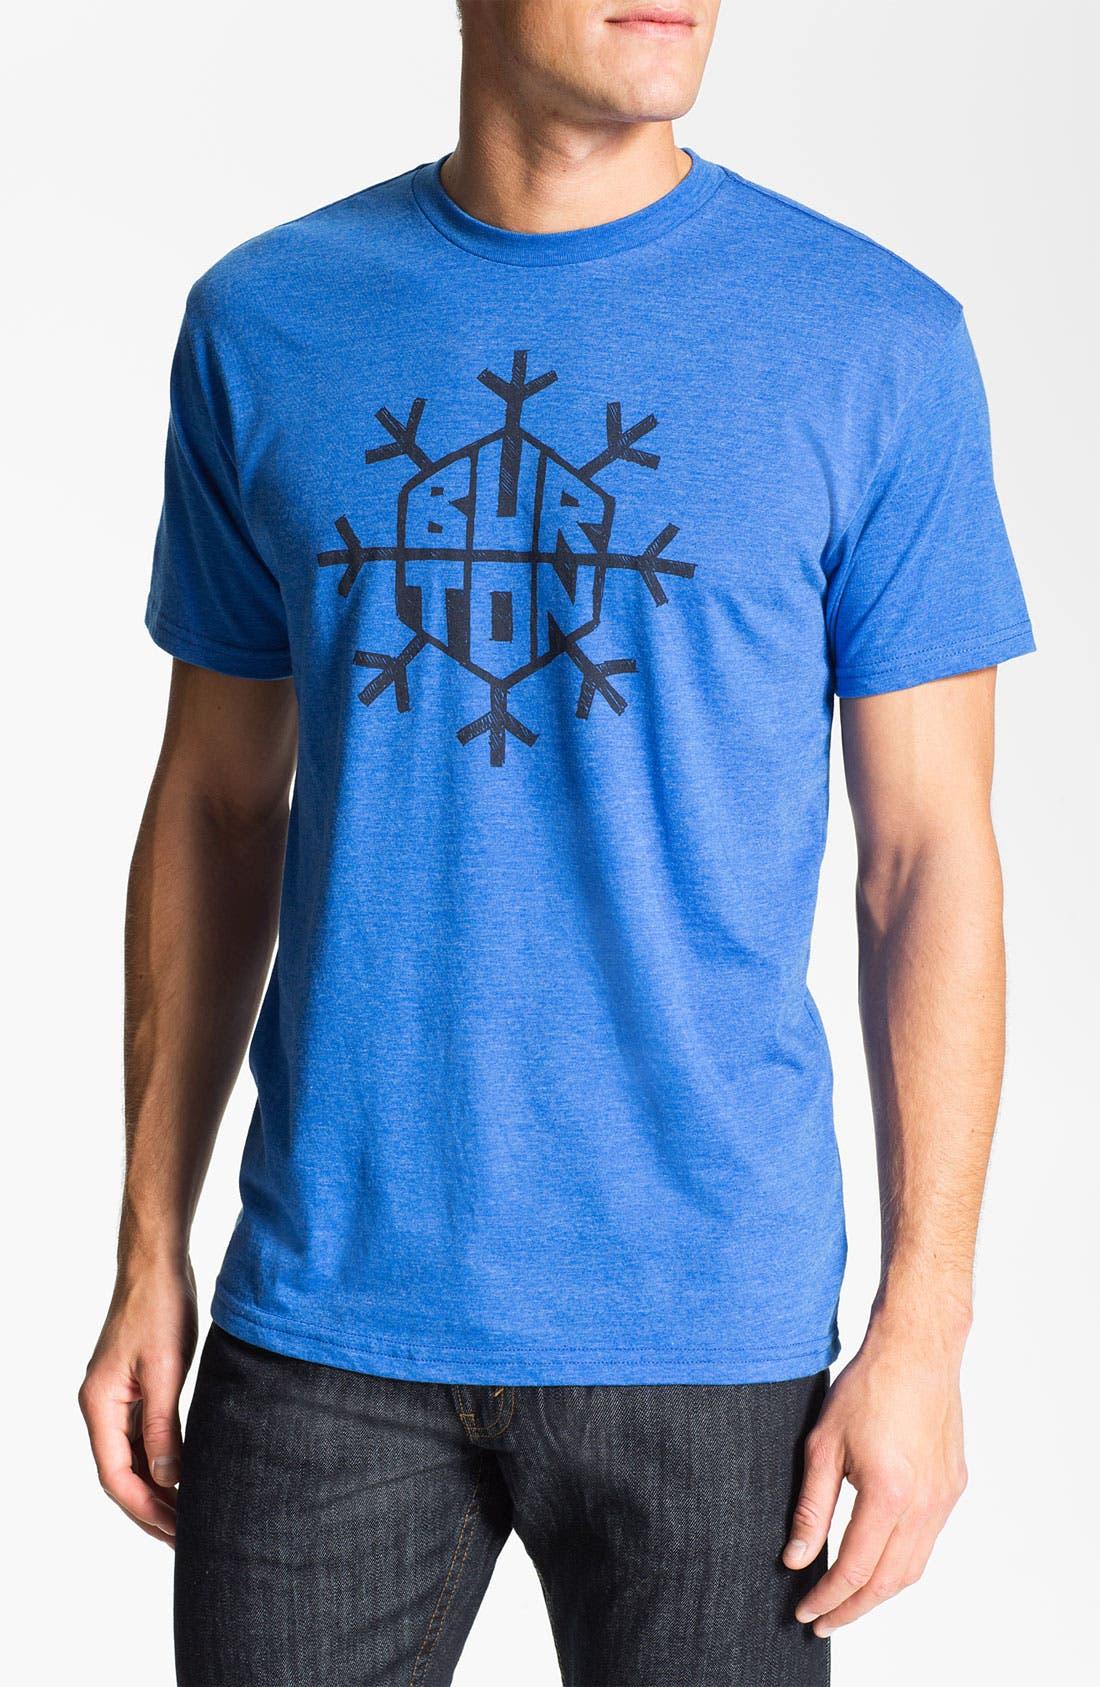 Alternate Image 1 Selected - Burton 'Flake' Graphic T-Shirt